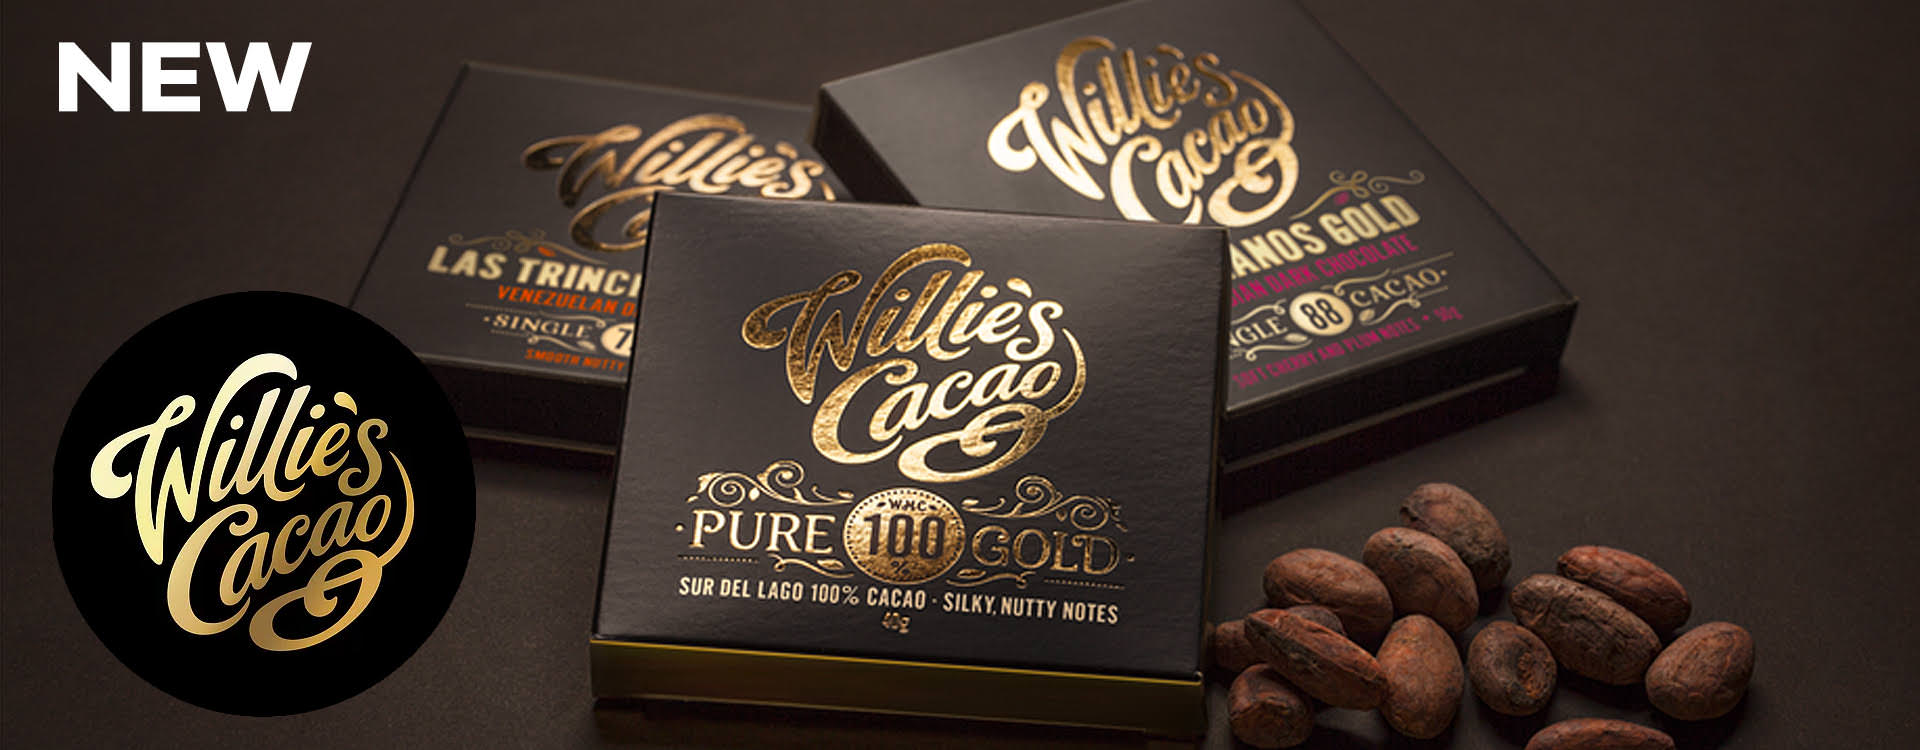 Willie's Cacao Chocolate Range